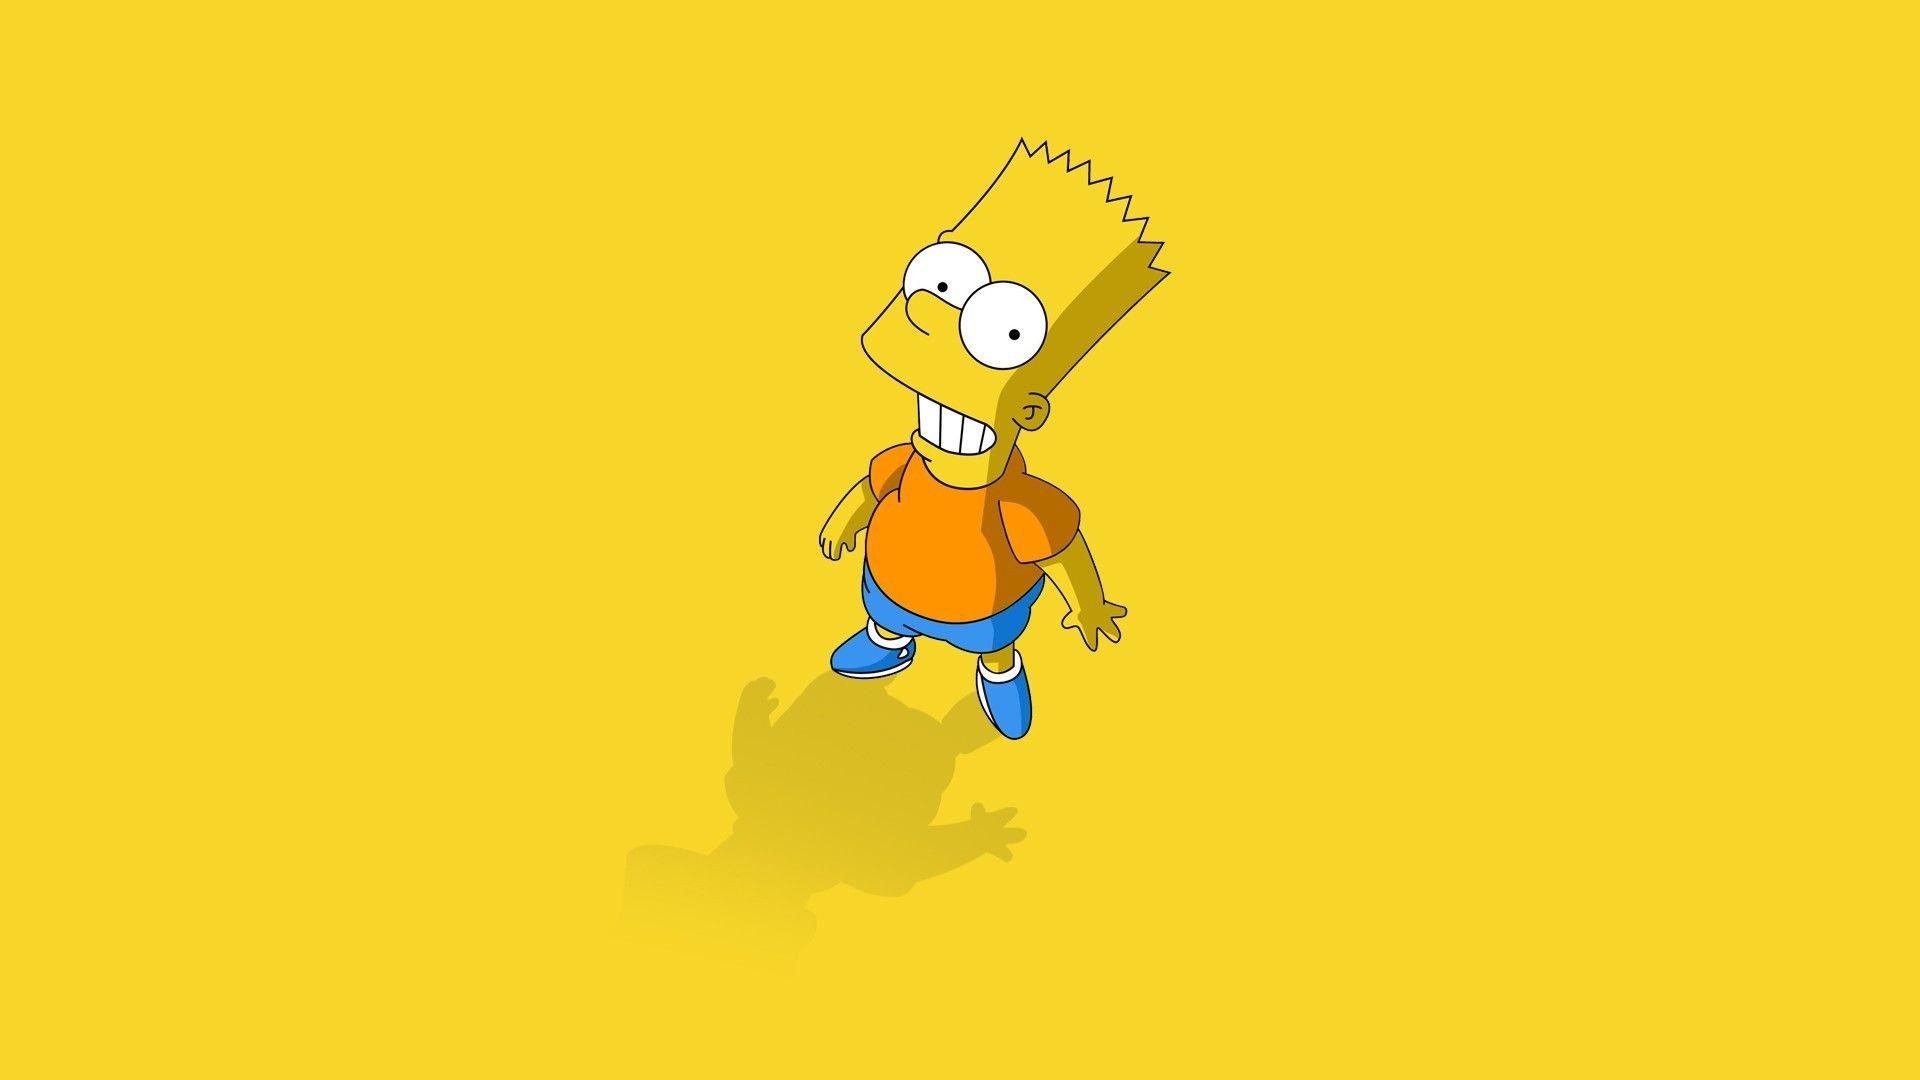 Simpsons Phone Wallpapers